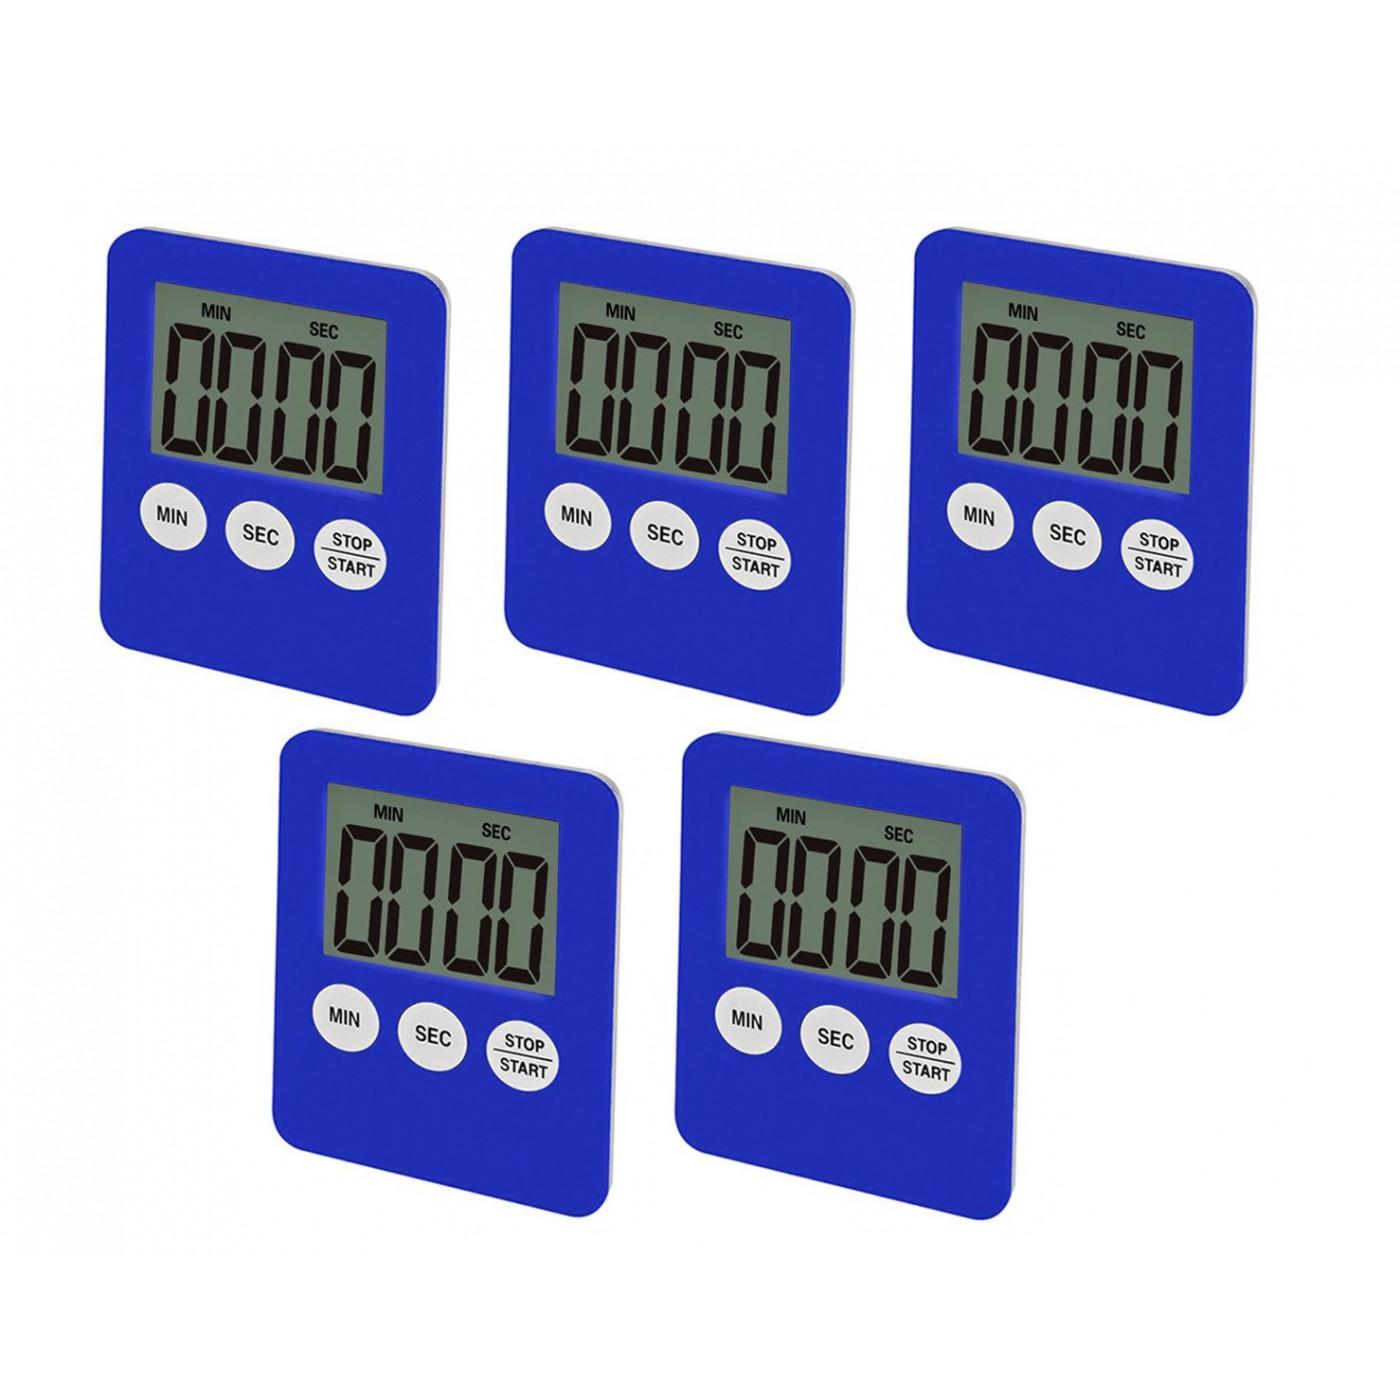 Set of 5 digital timers, alarm clocks, blue  - 1